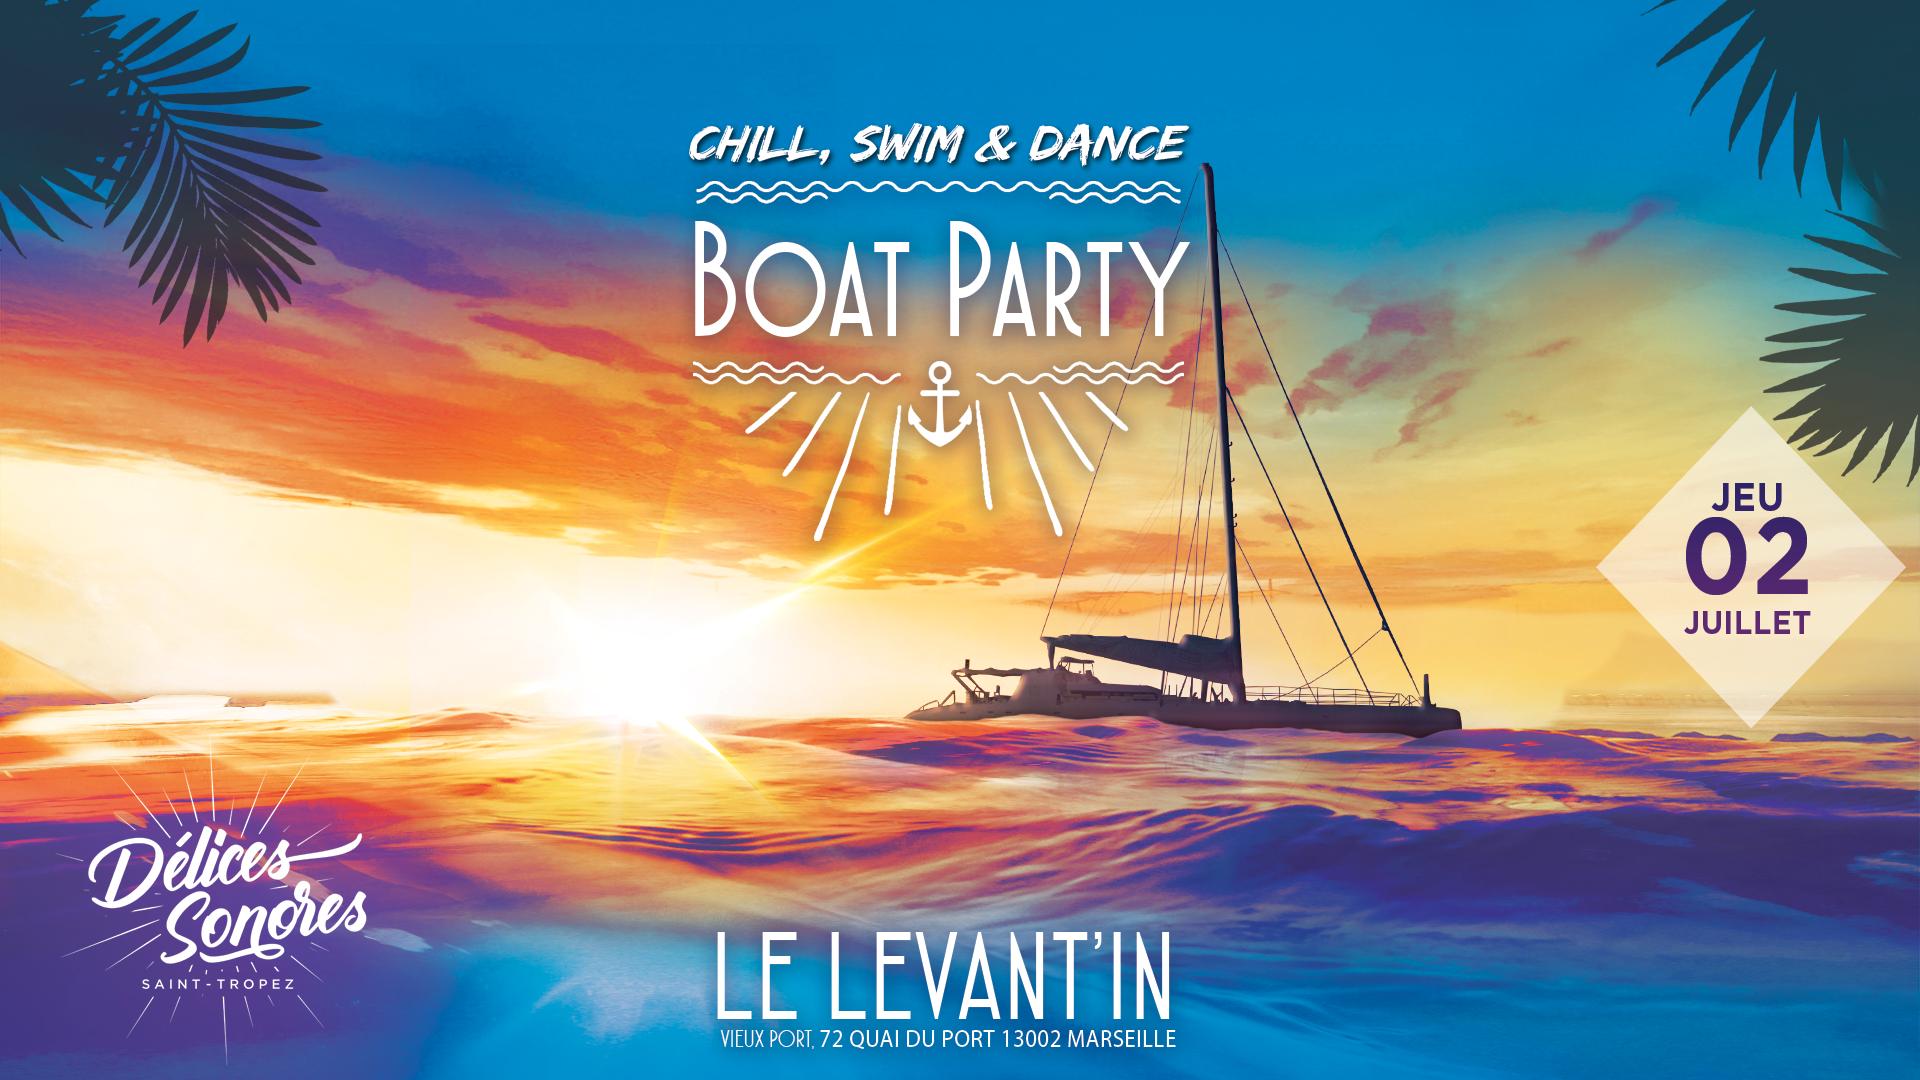 Delices sonores Boat Party